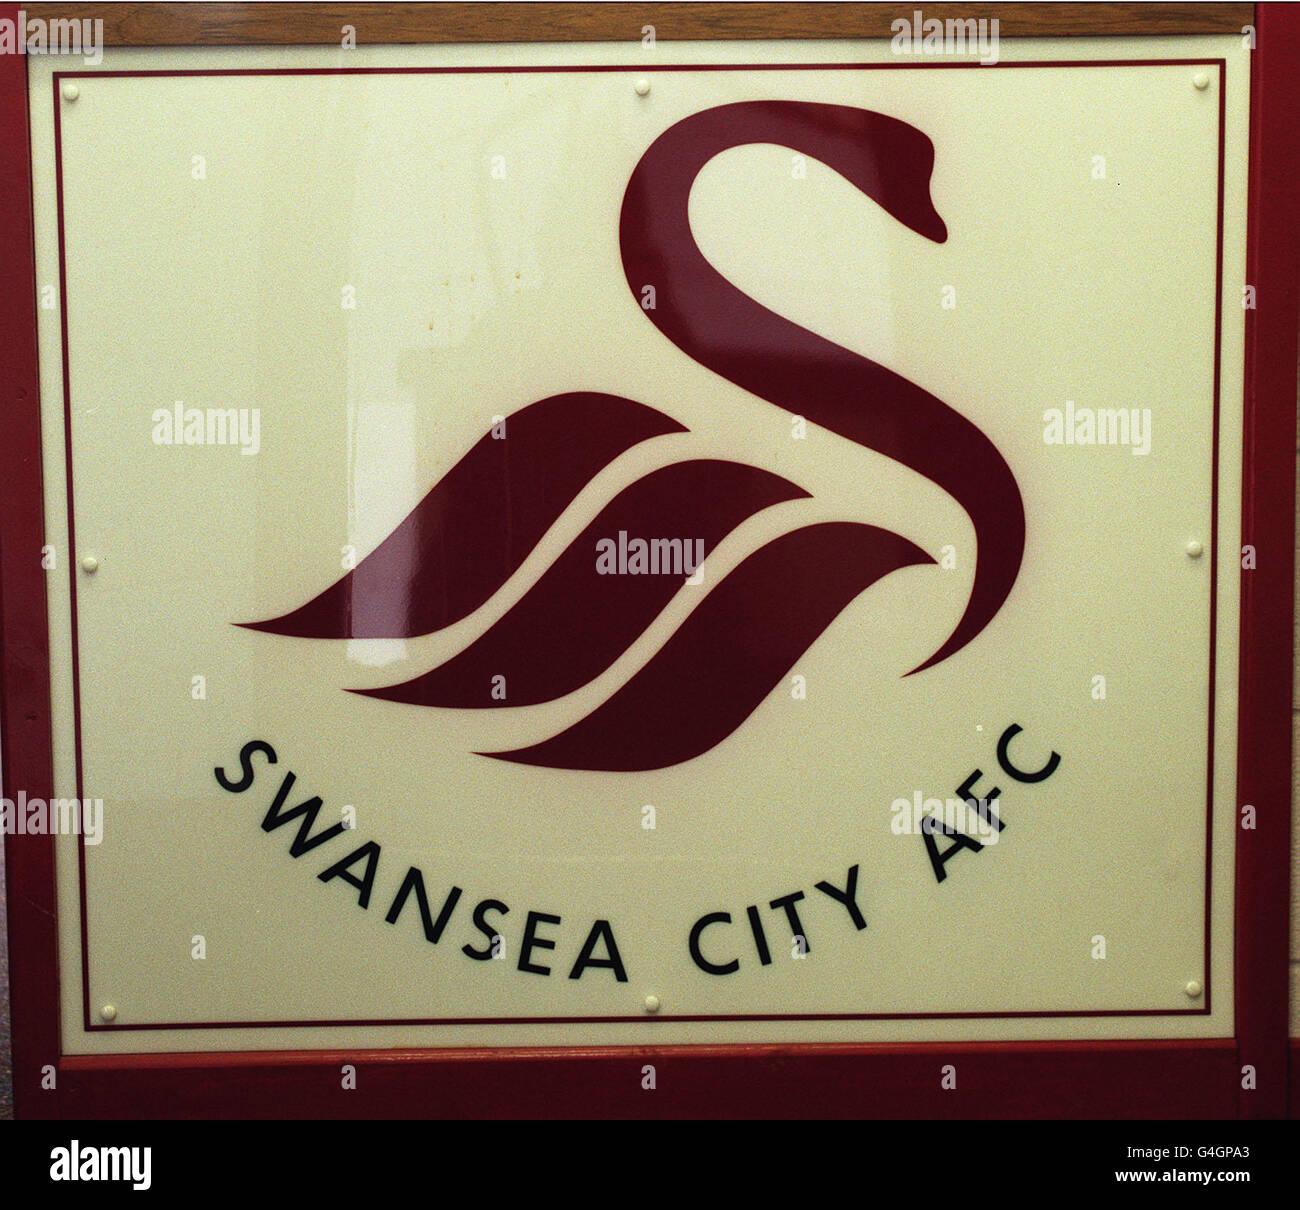 Swansea City football club badge - Stock Image